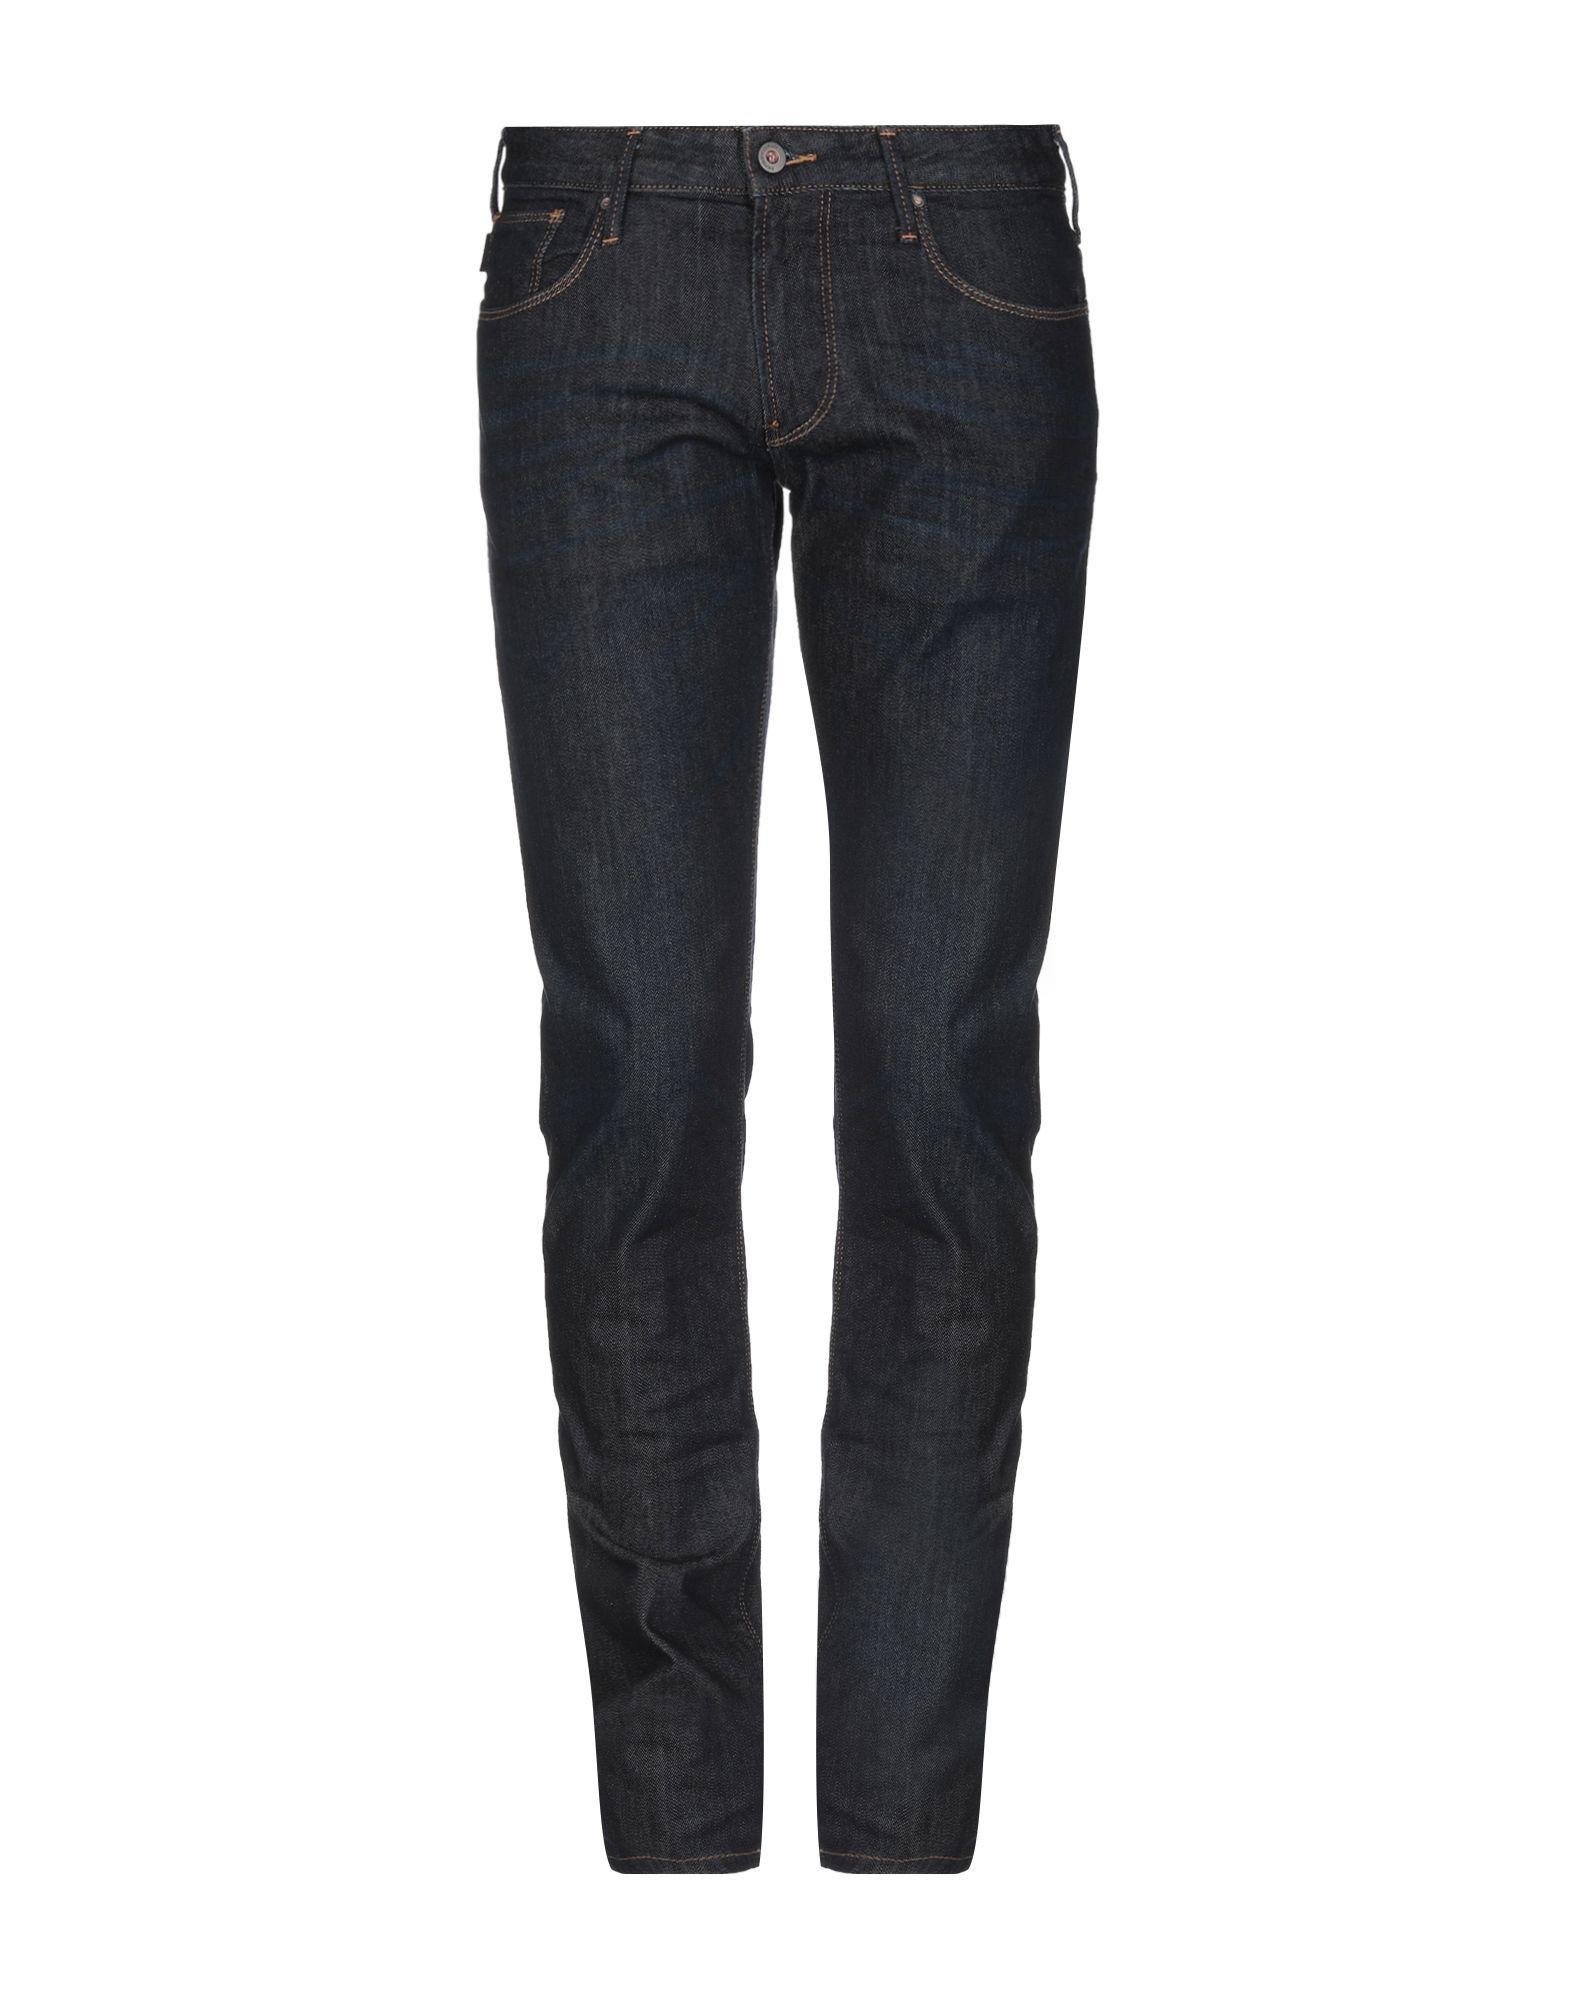 Pantaloni Jeans Emporio Emporio Armani uomo - 42711895VI  Sparen Sie bis zu 70% Rabatt